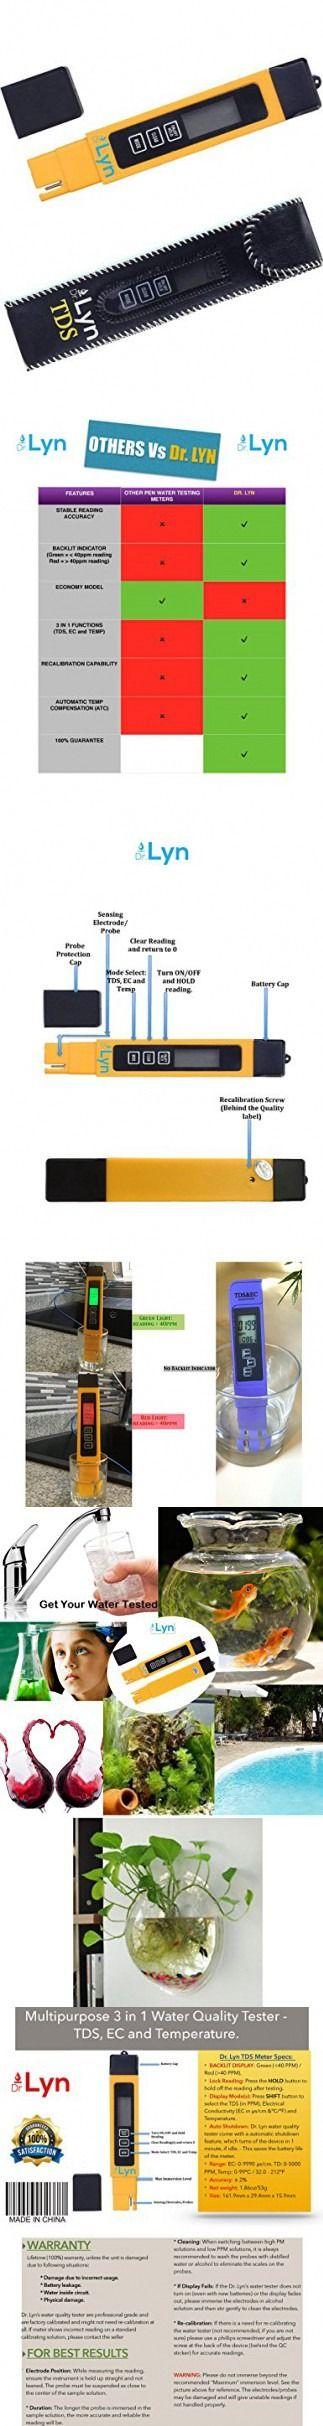 Dr  Lyn Digital 3 in 1 TDS Pen Zero Water Quality PPM Tester Meter